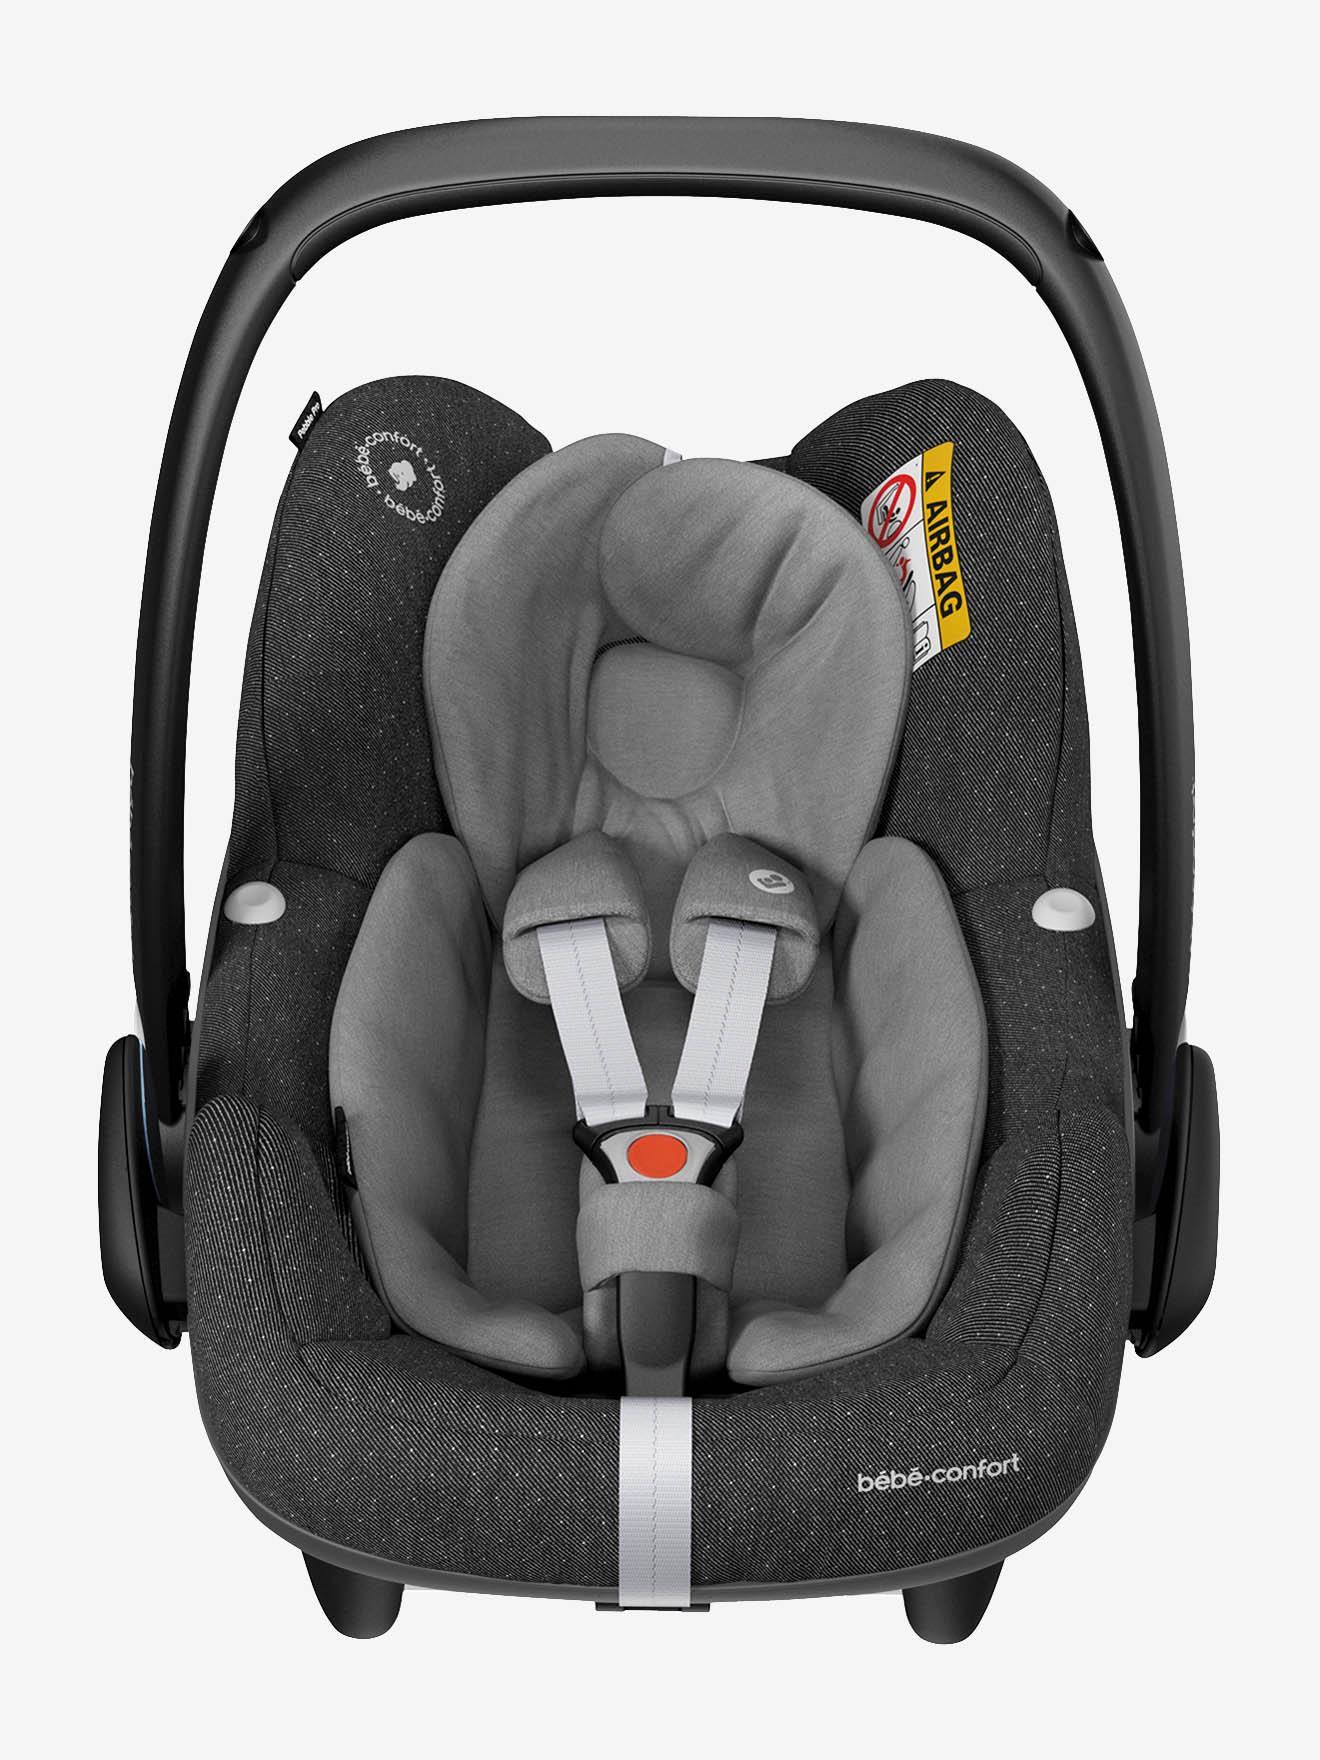 Cadeira-auto Cosi Pebble Pro i-Size, BEBE CONFORT cinzento medio liso